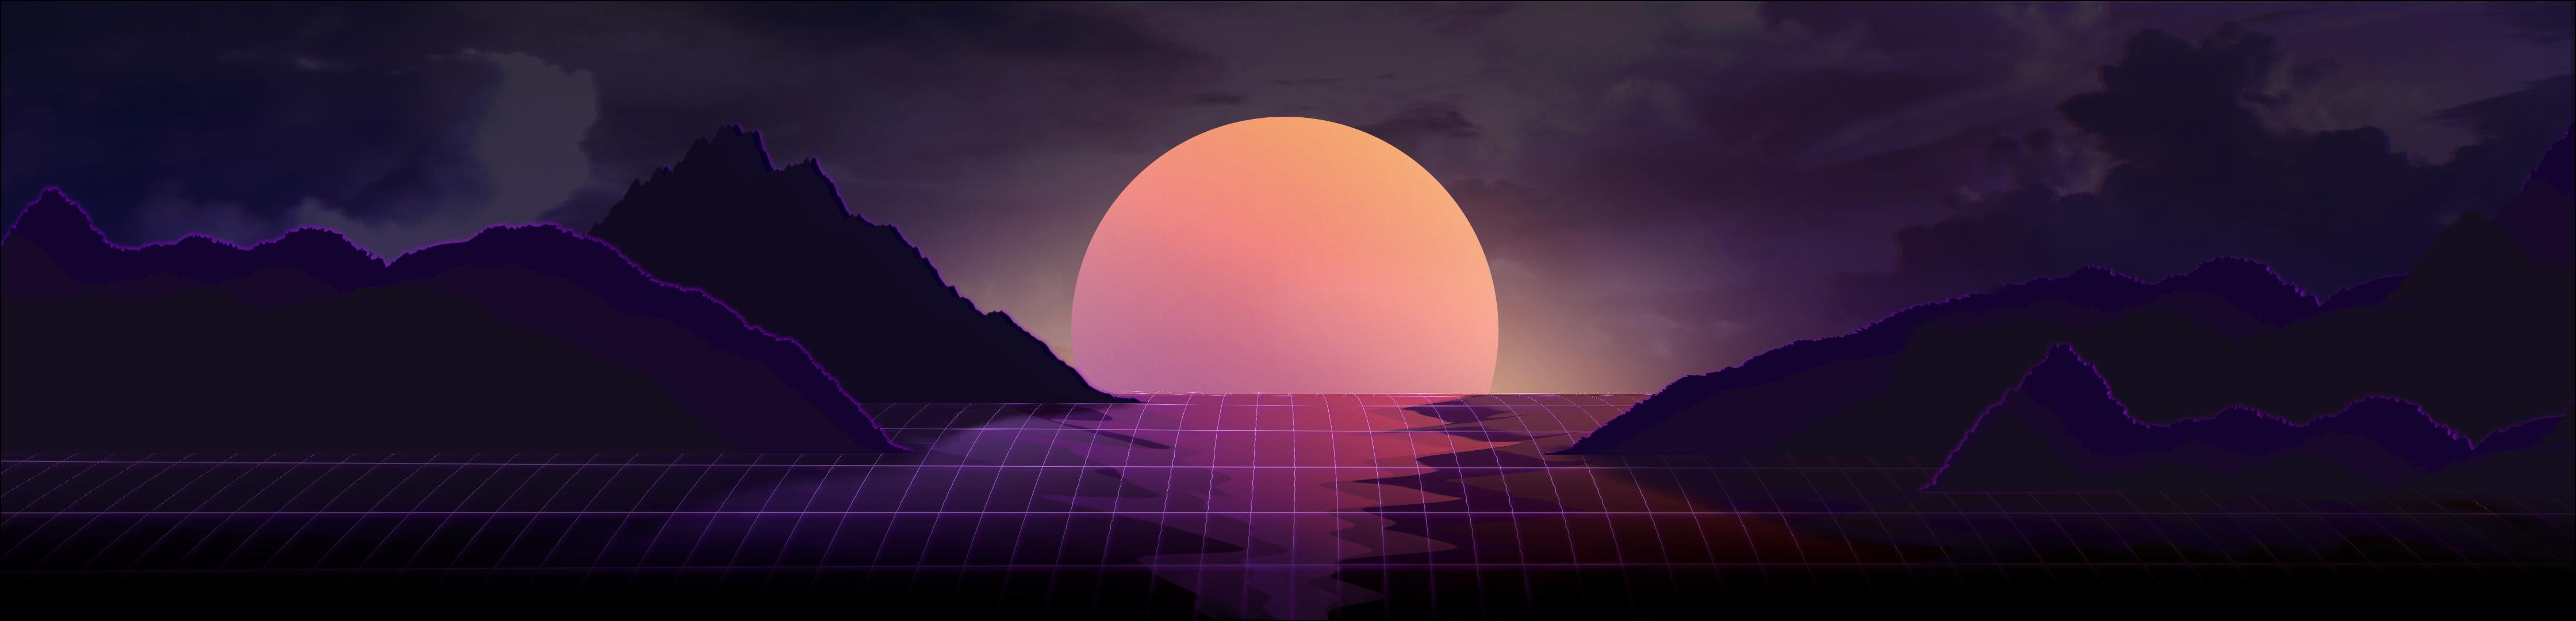 Vaporwave Sunset V2 4480x1080 Psd Iphone Wallpaper Vaporwave Waves Wallpaper Sunset Wallpaper